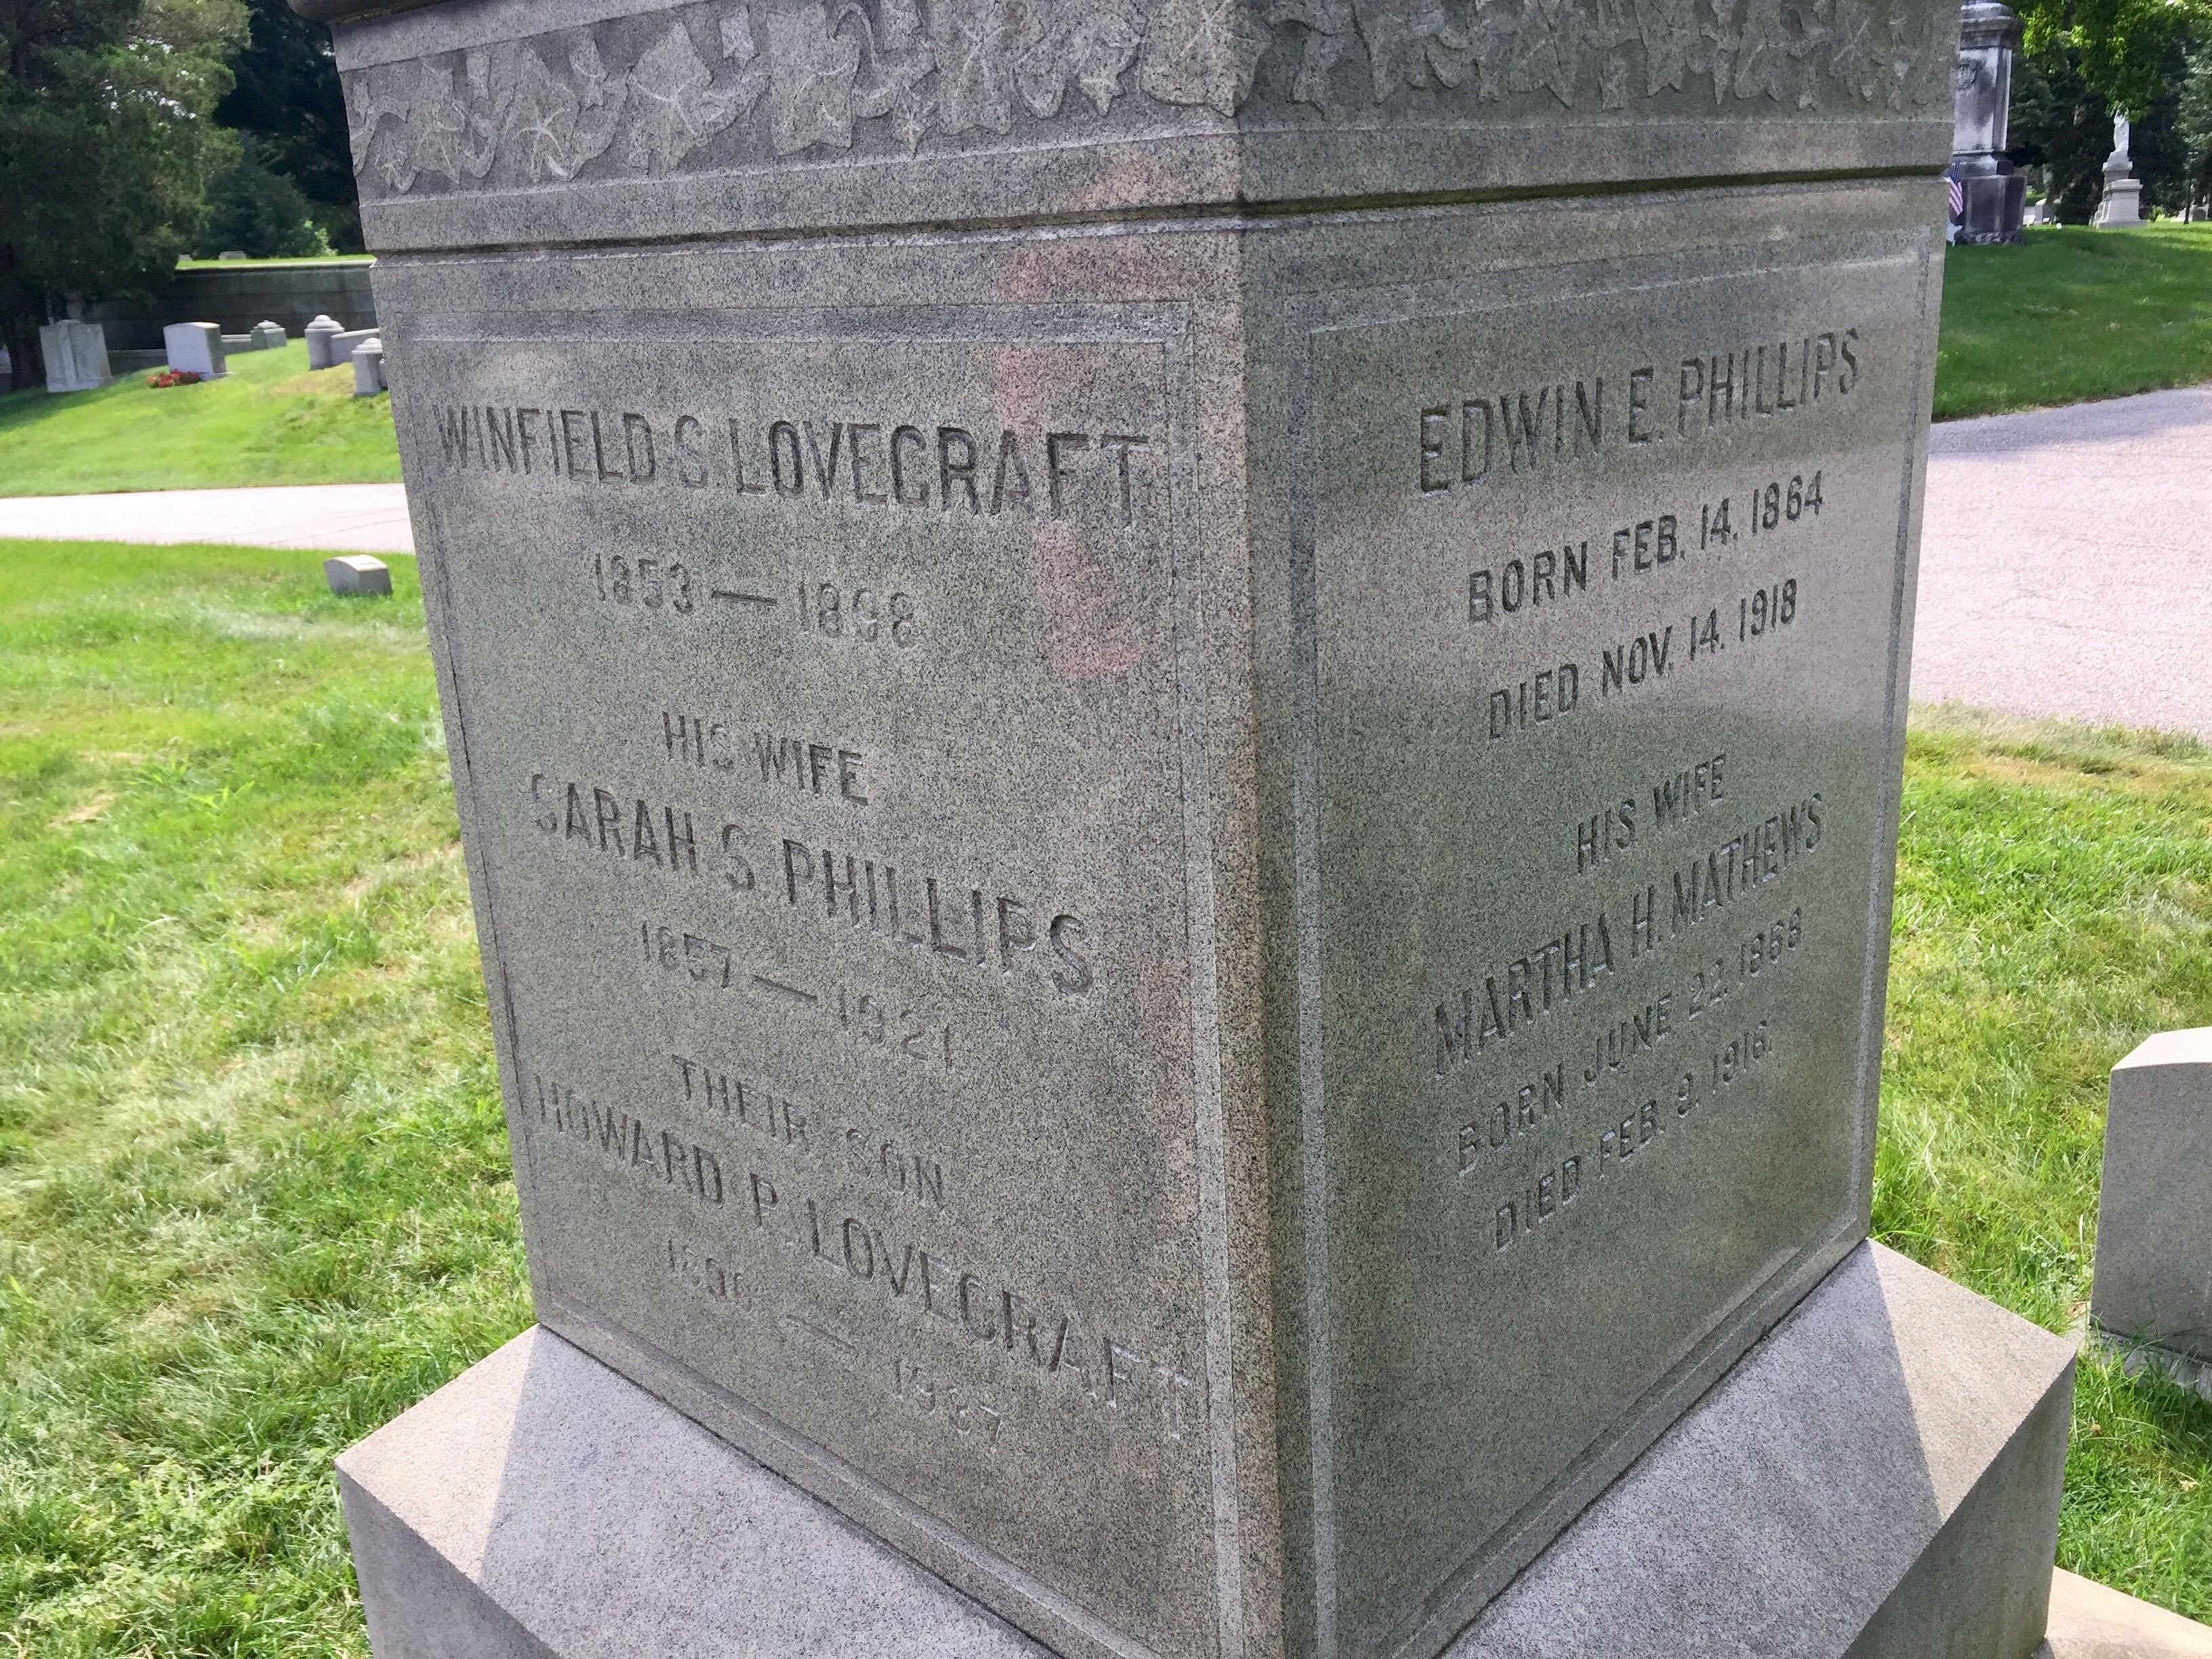 The Lovecraft Obelisk